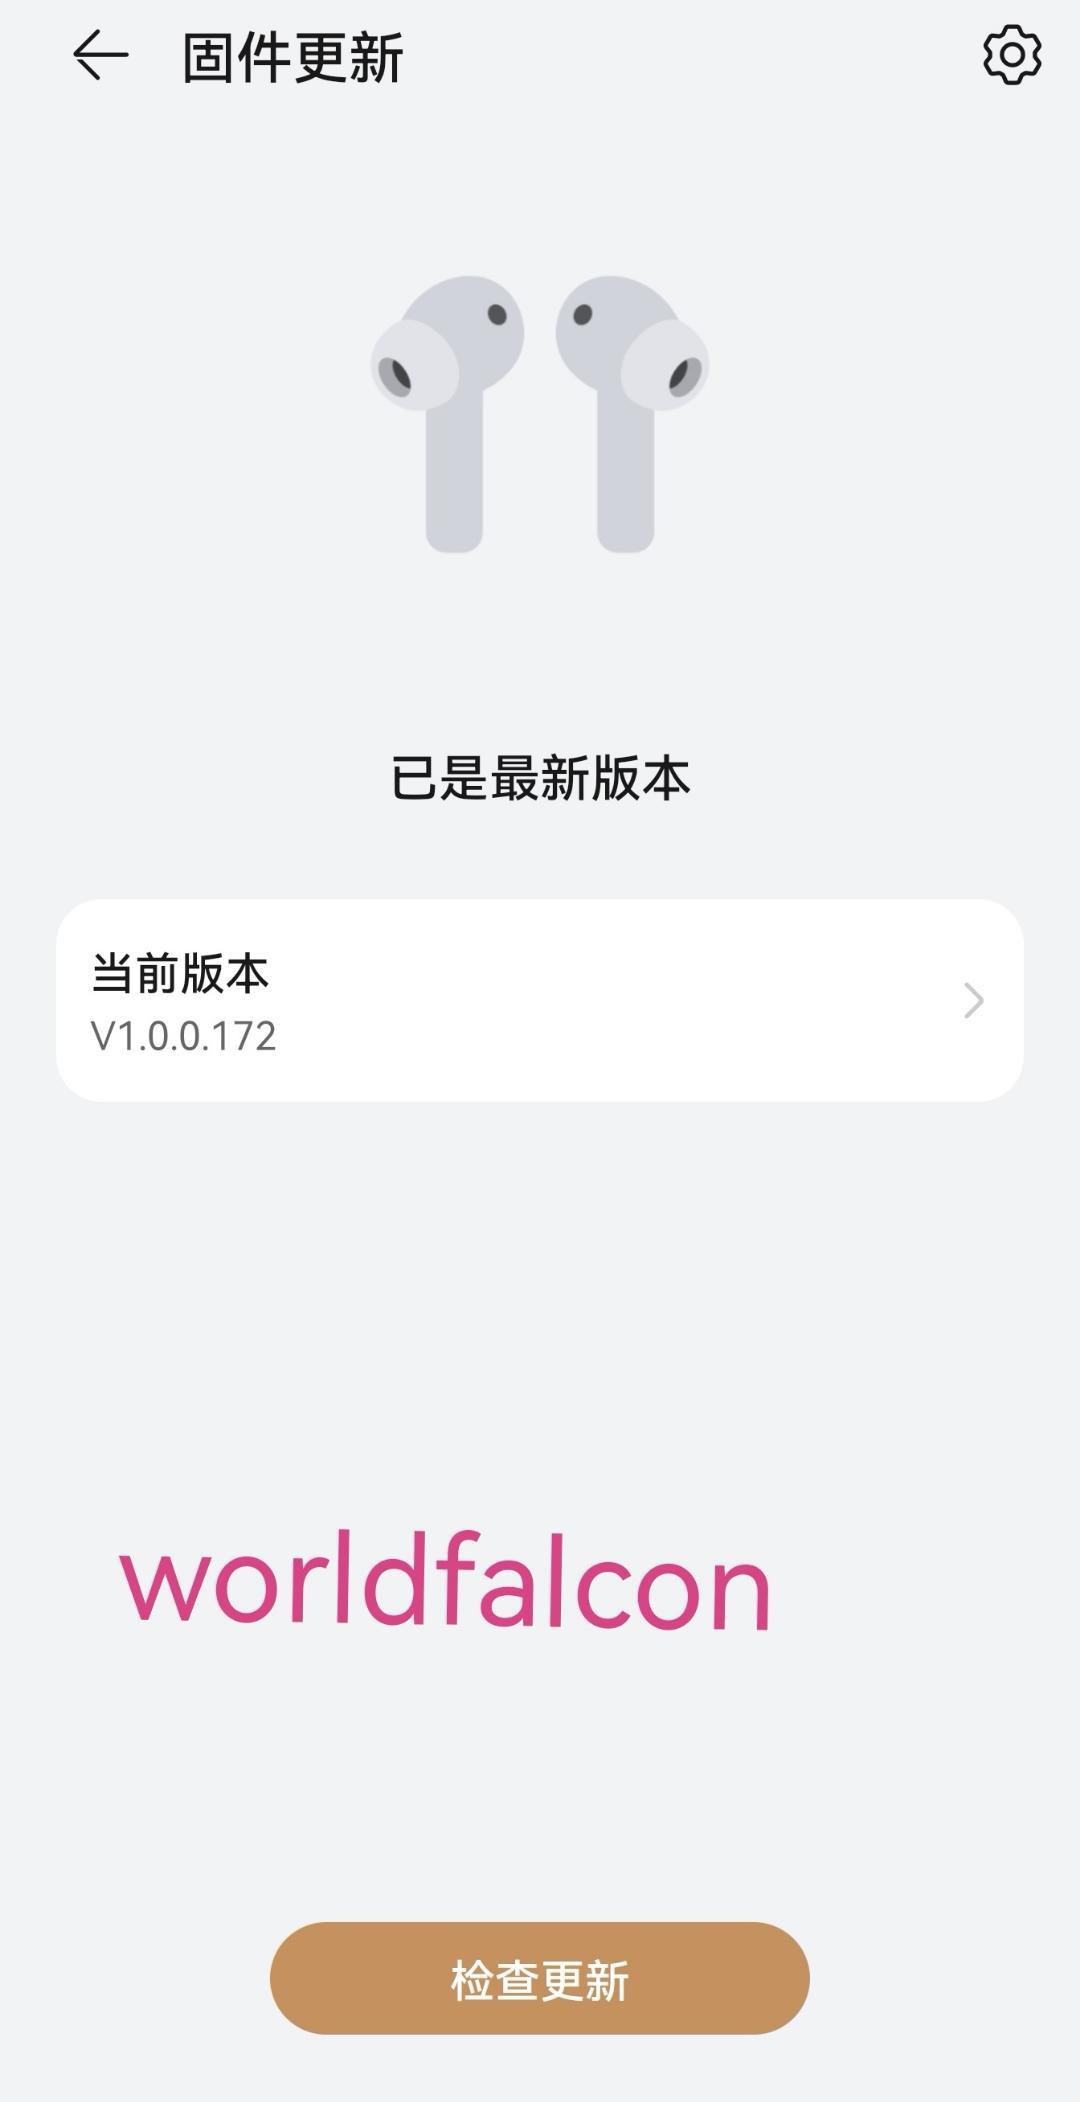 Screenshot_20210607_165610_com.huawei.smarthome_edit_7433815449385.jpg